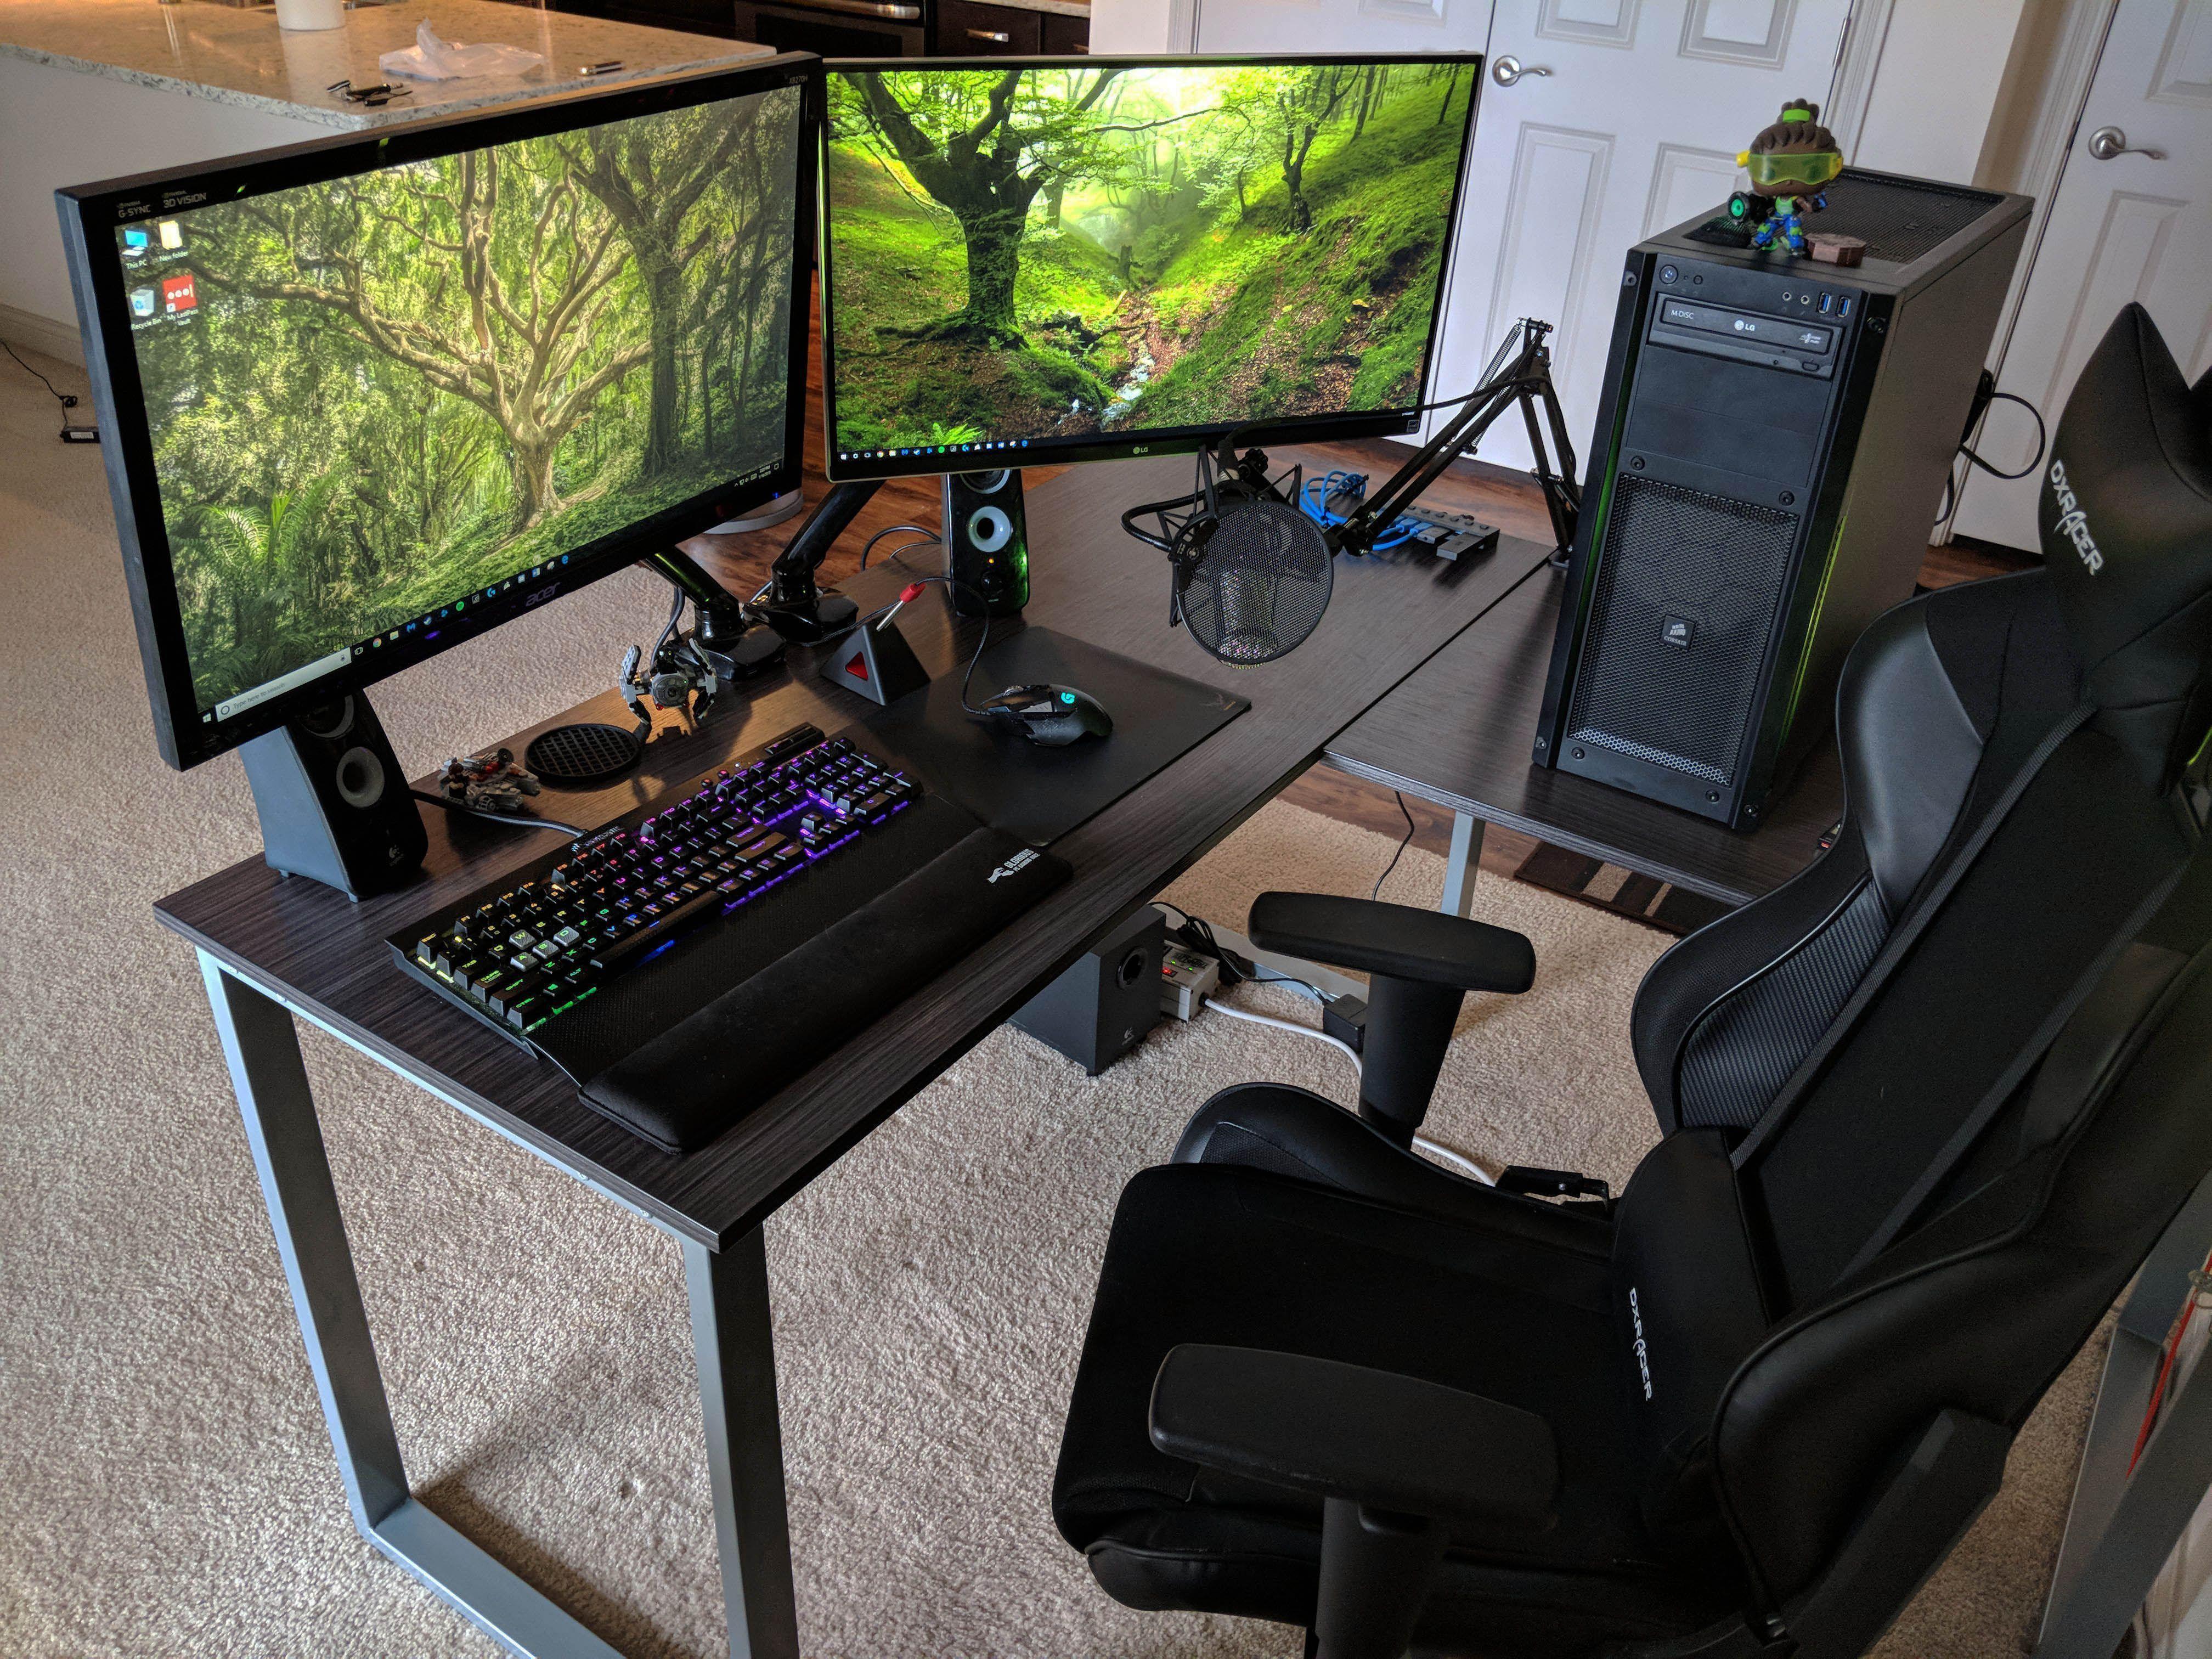 Terrific Gaming Desk Diy For 2019 Ift Tt 2m2jh2a Ift Tt 36xlpyj